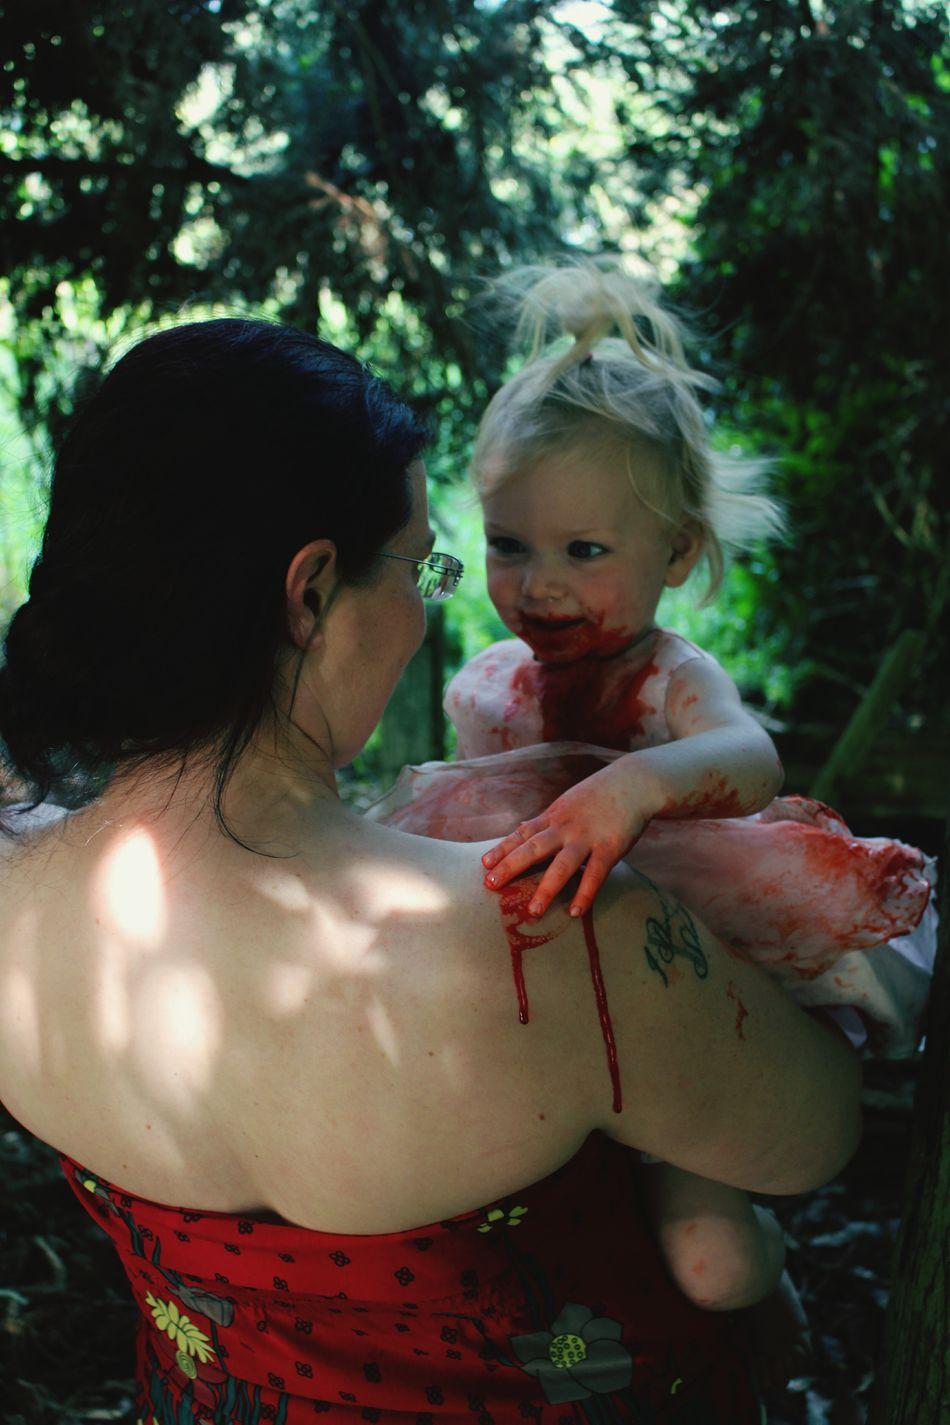 Ill Get You... Horror Happy Halloween! Horror Photography Innocence Enjoying Life Halloween2015 Love So Pure Mother & Daughter Open Edit